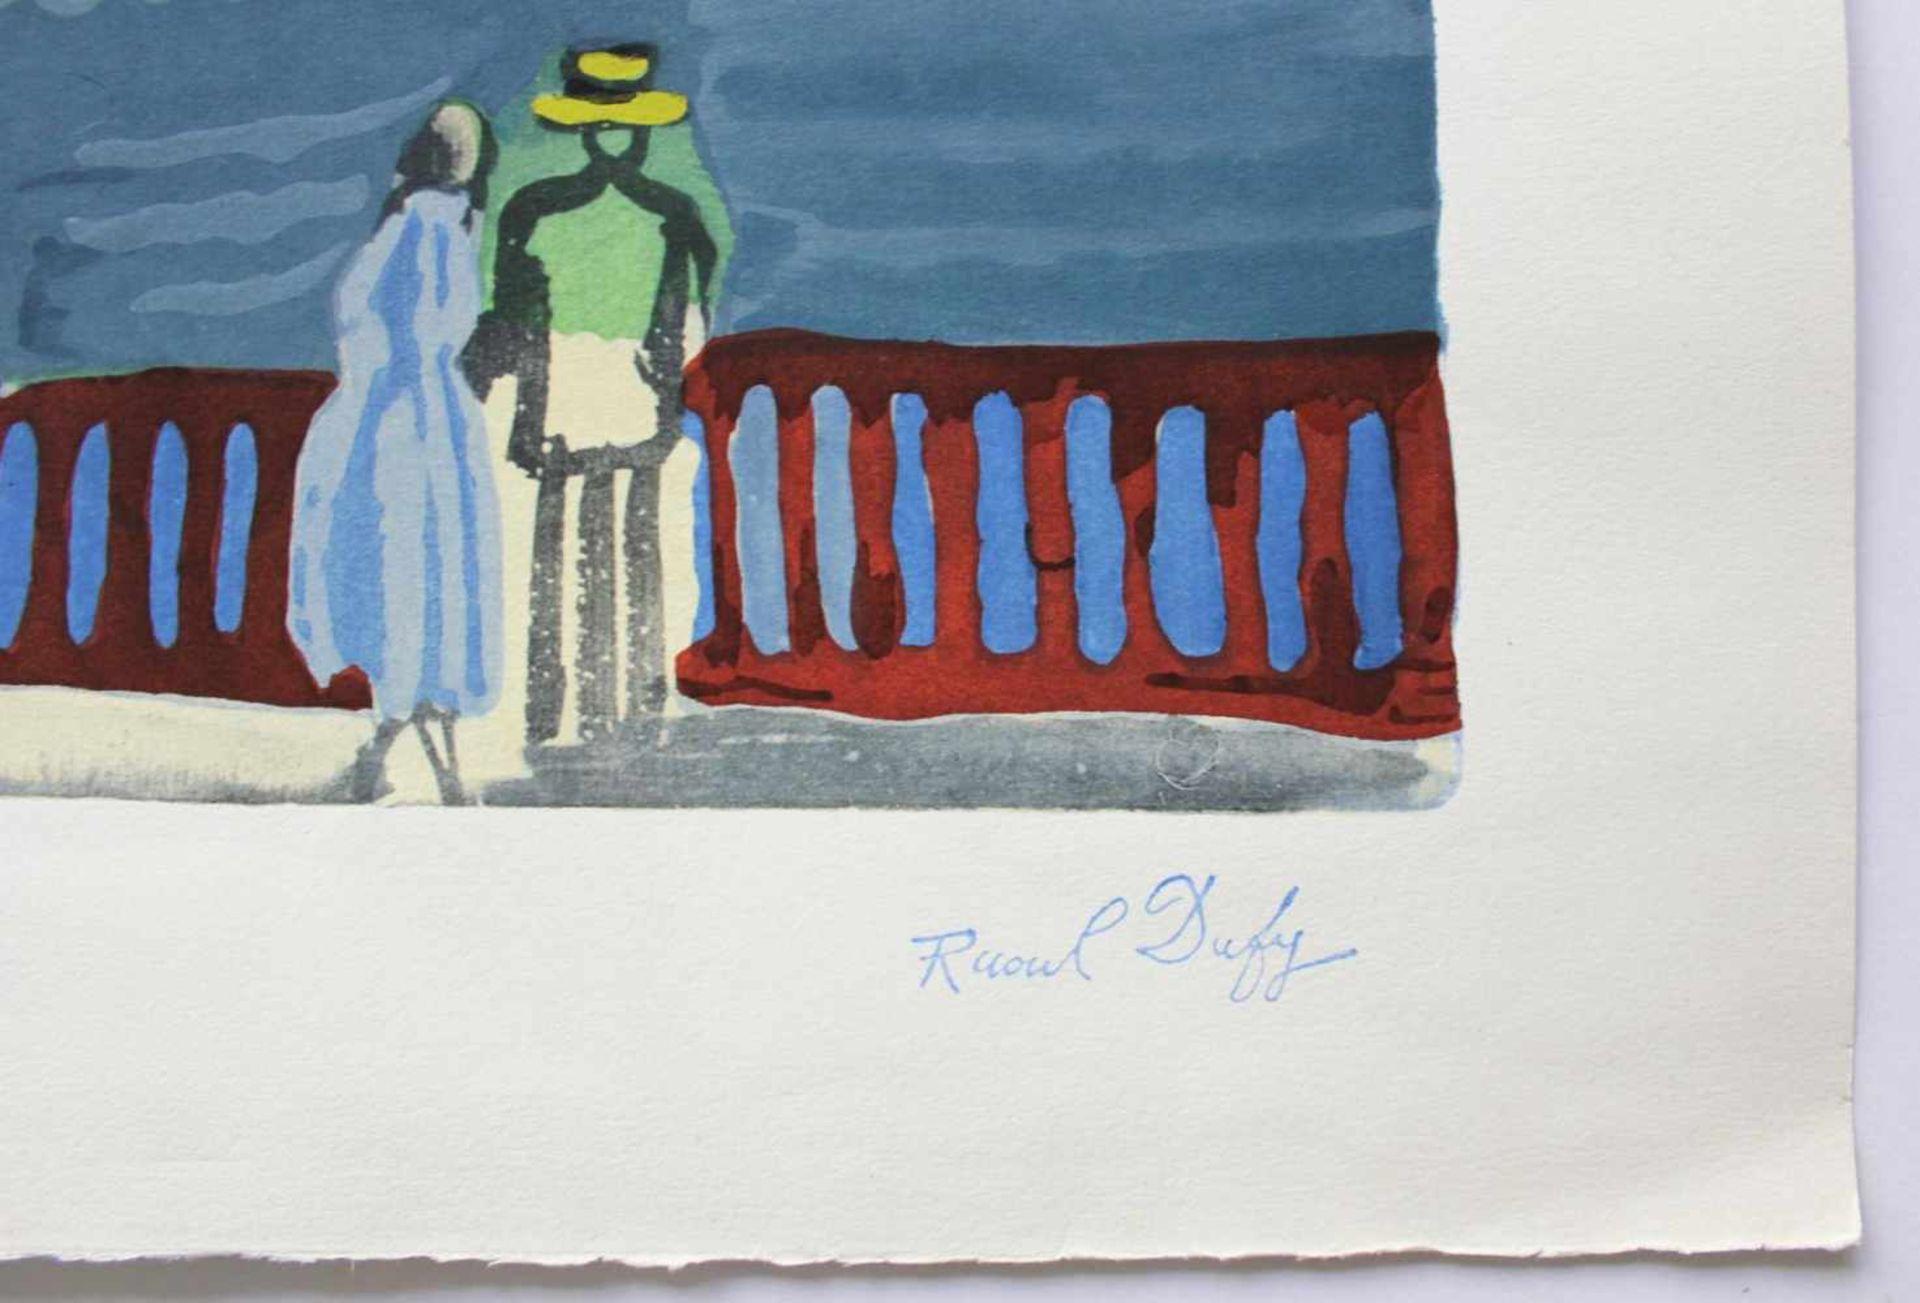 Raoul Dufy 1877 - 1953 Strandpromenade Lithographie stempelsigniert, nummeriert 301/5000 56 x 66 cm - Bild 2 aus 3